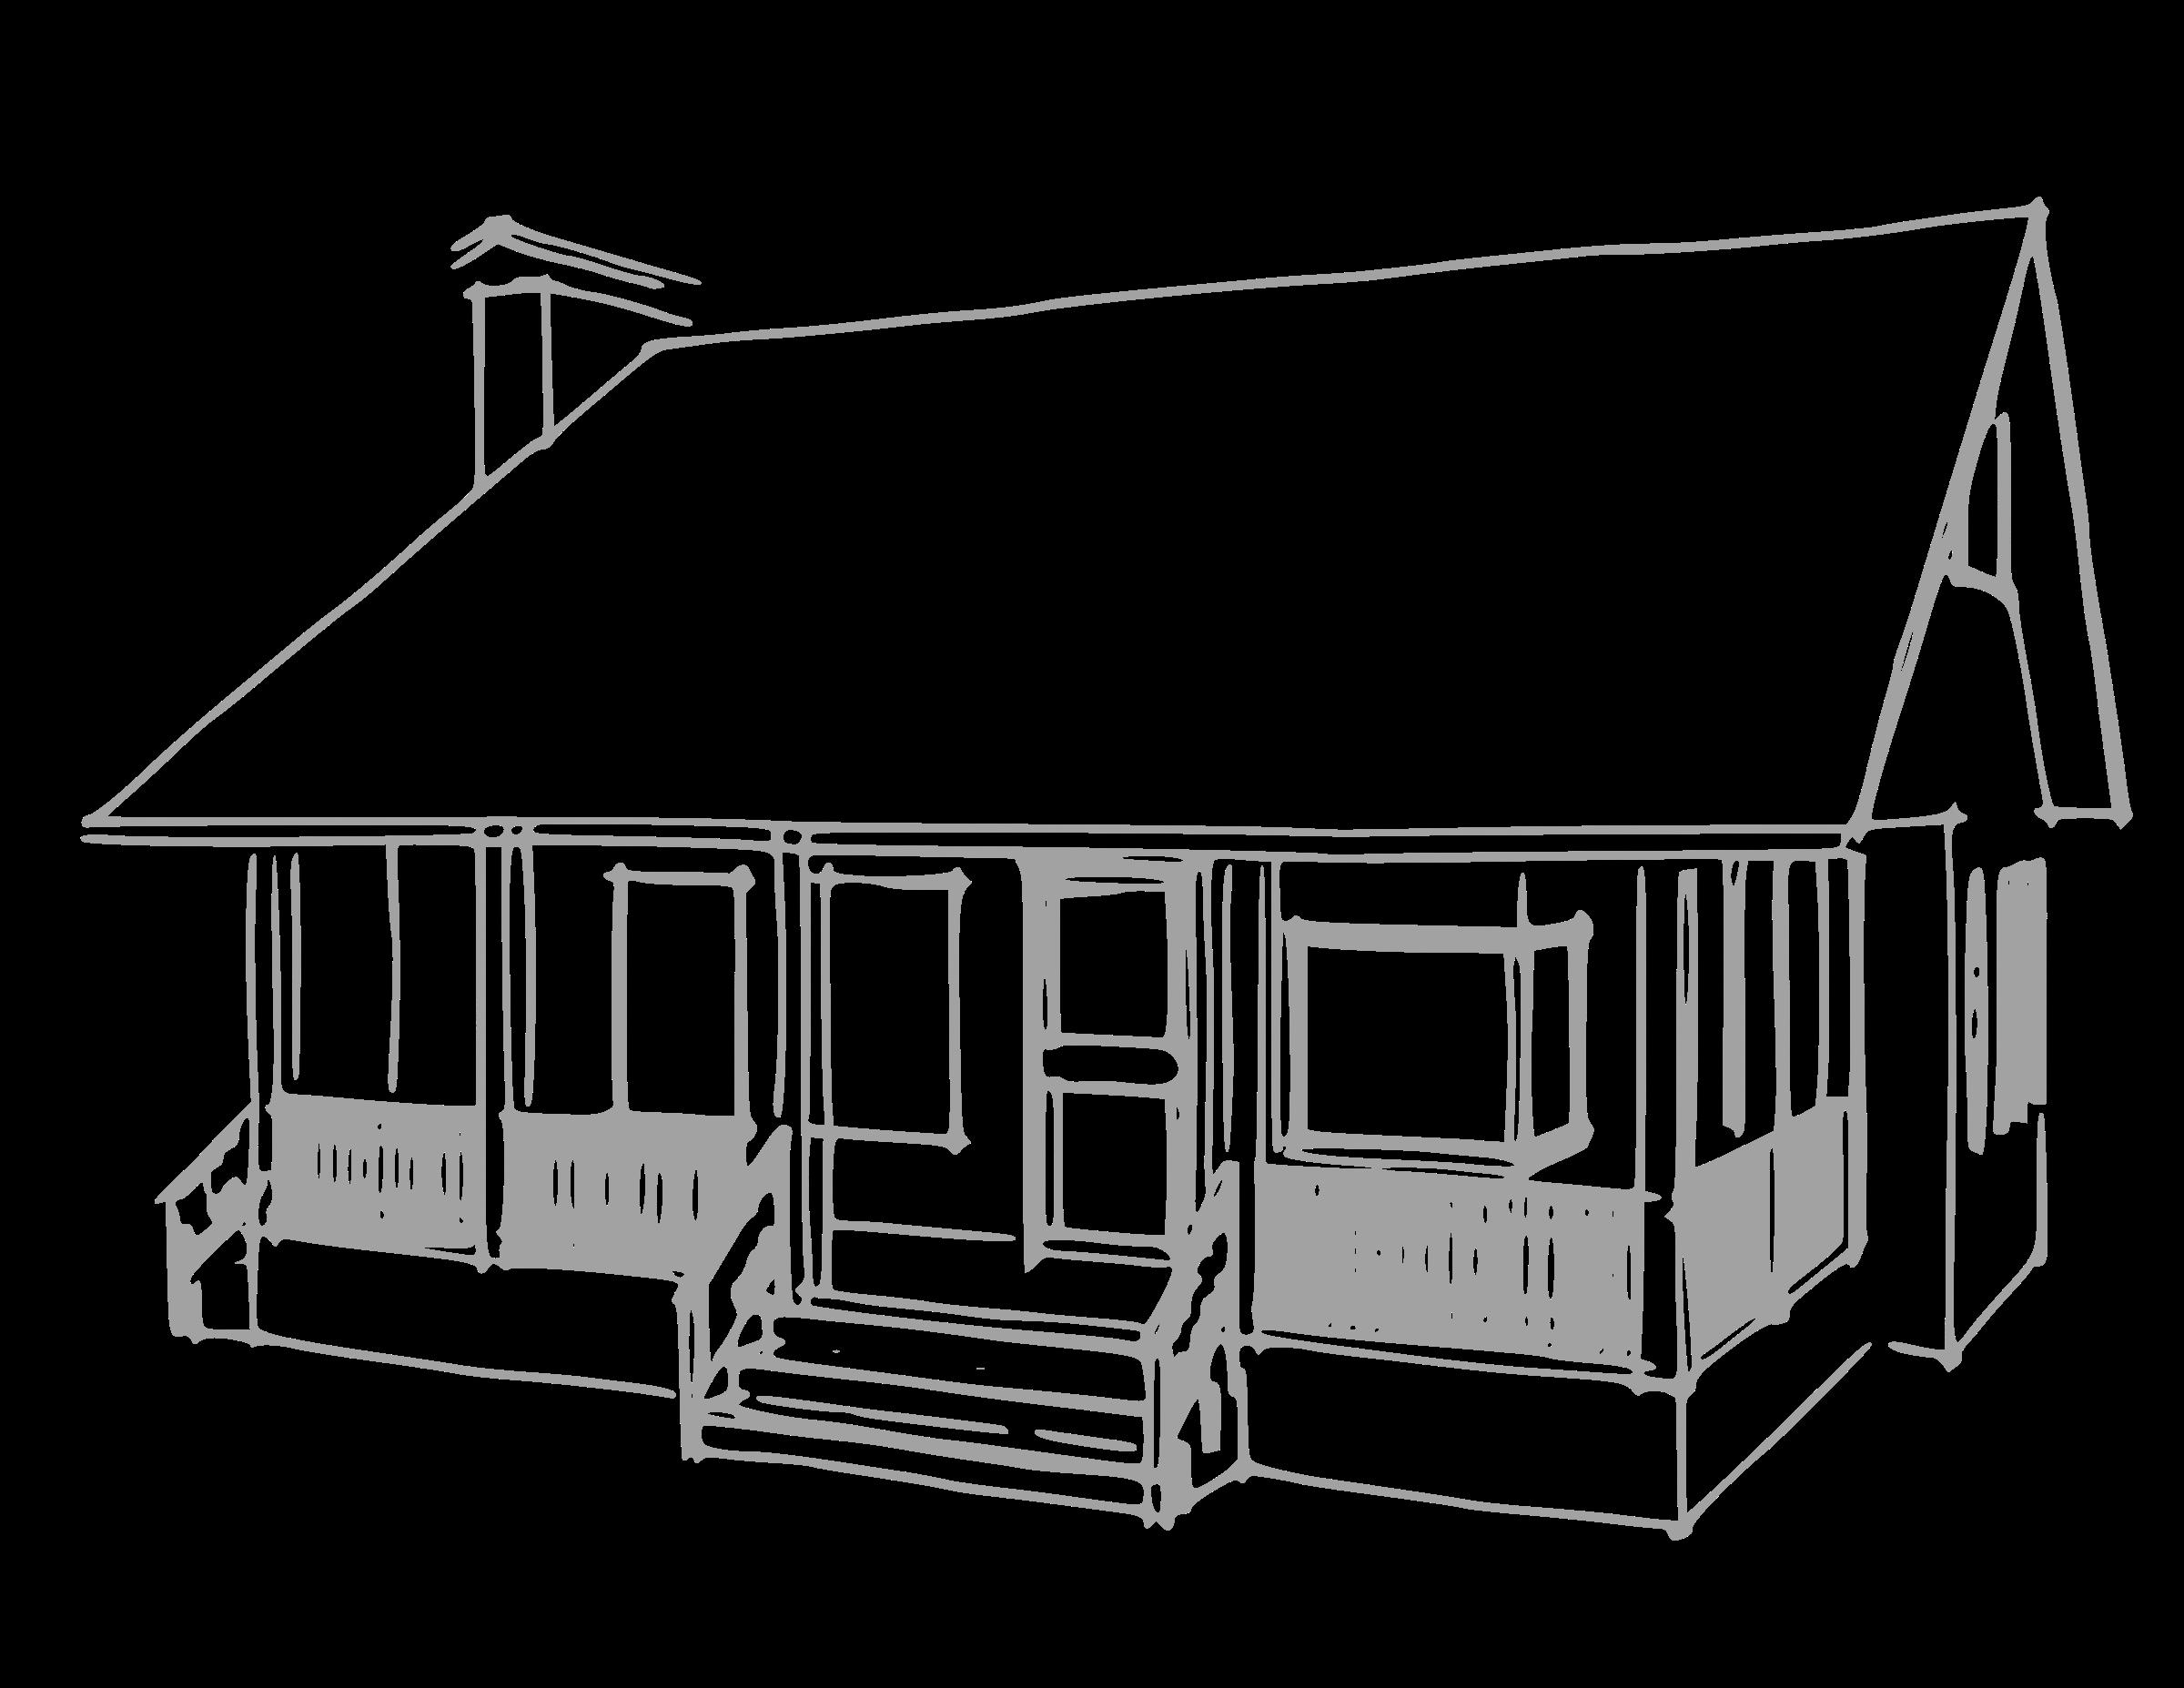 Wagon clipart cabin. House porch gucciguanfangwang me